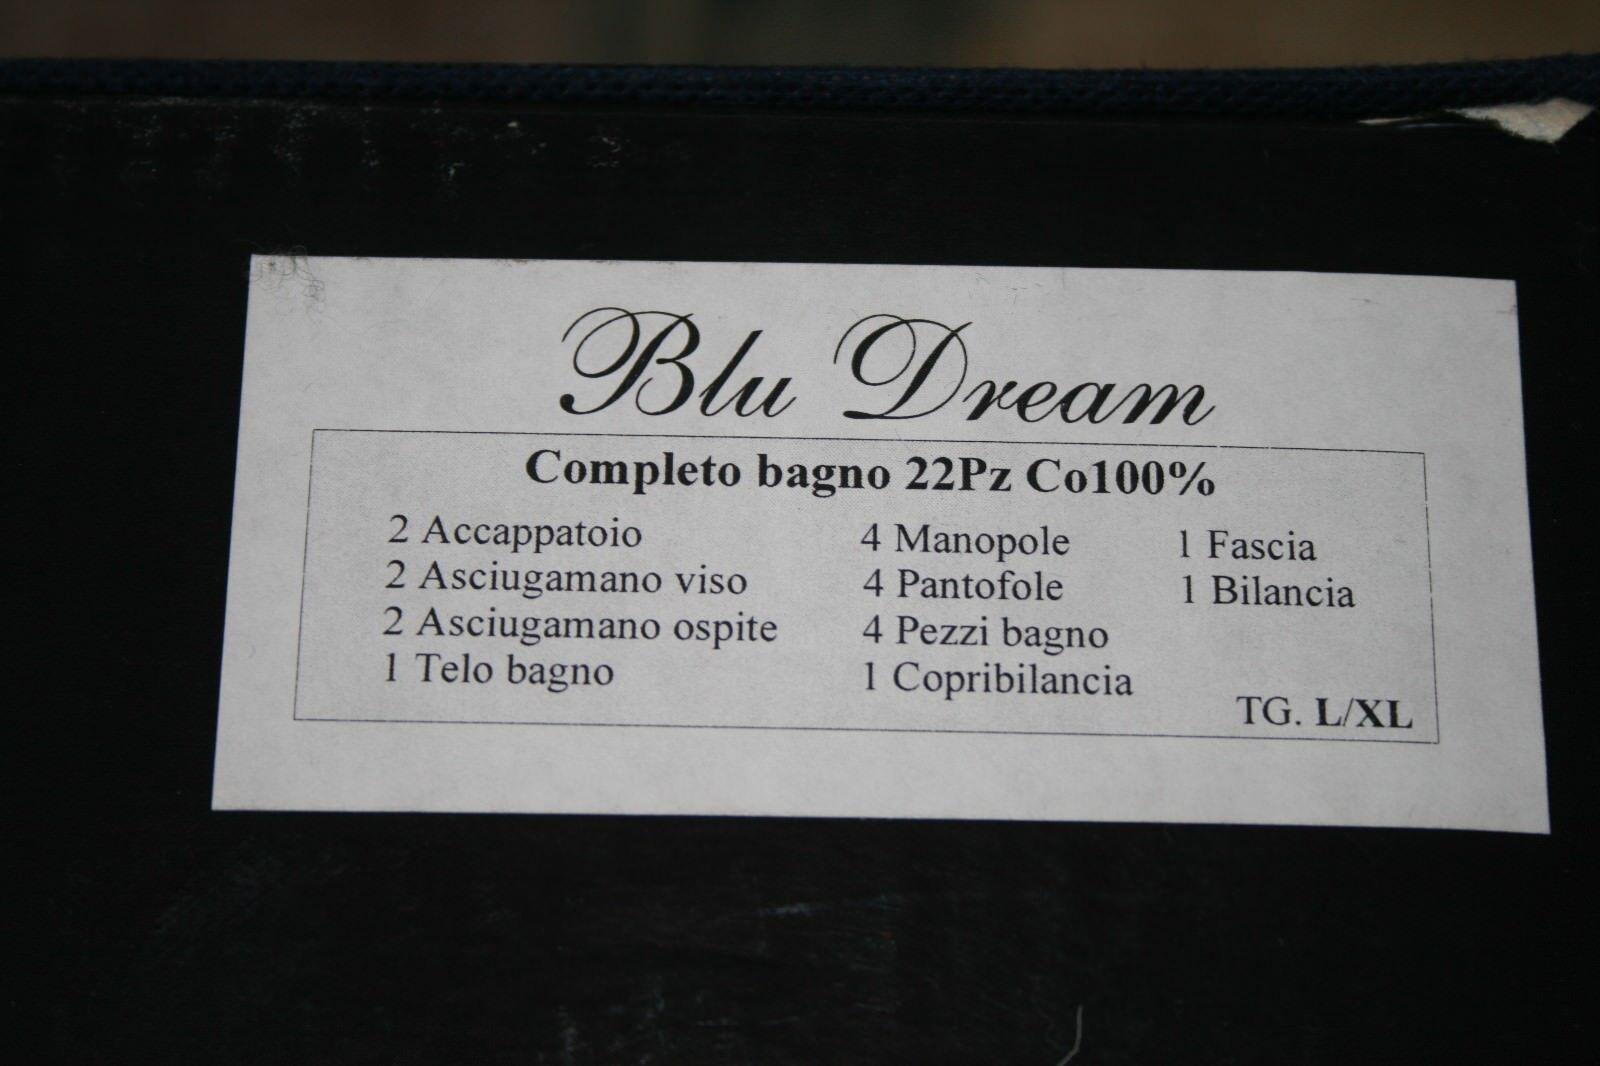 SET COMPLETO DI ASCIUGAMANI ASCIUGAMANI ASCIUGAMANI IN SPUGNA DA CORrotO 6f7b7b